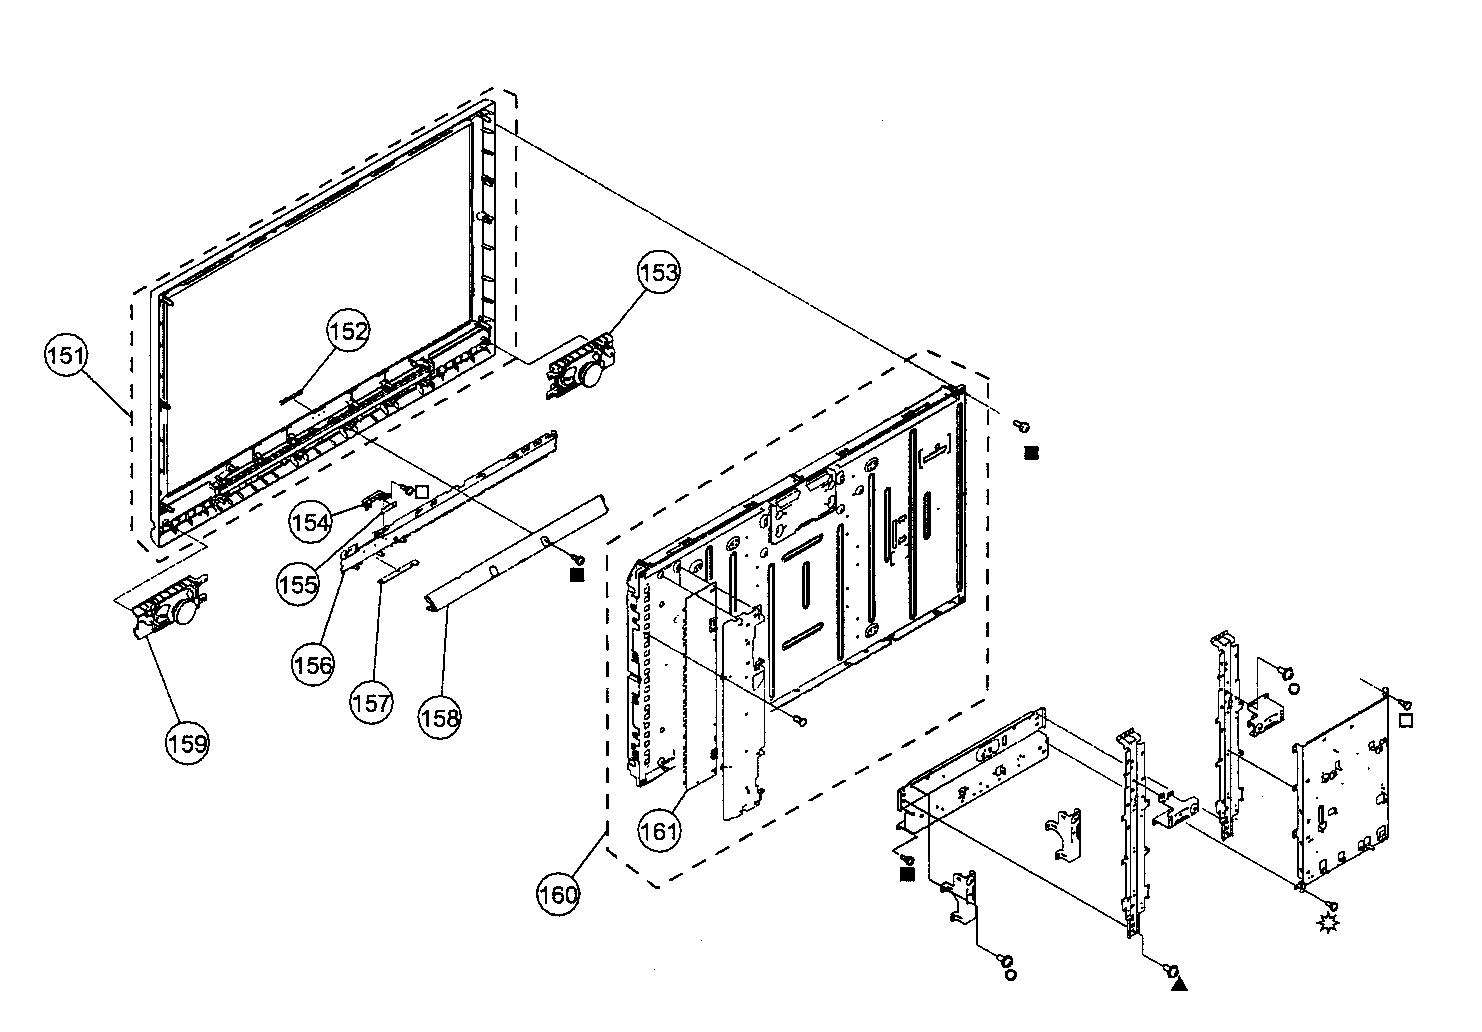 Sony model KDL-40V4100 lcd television genuine parts